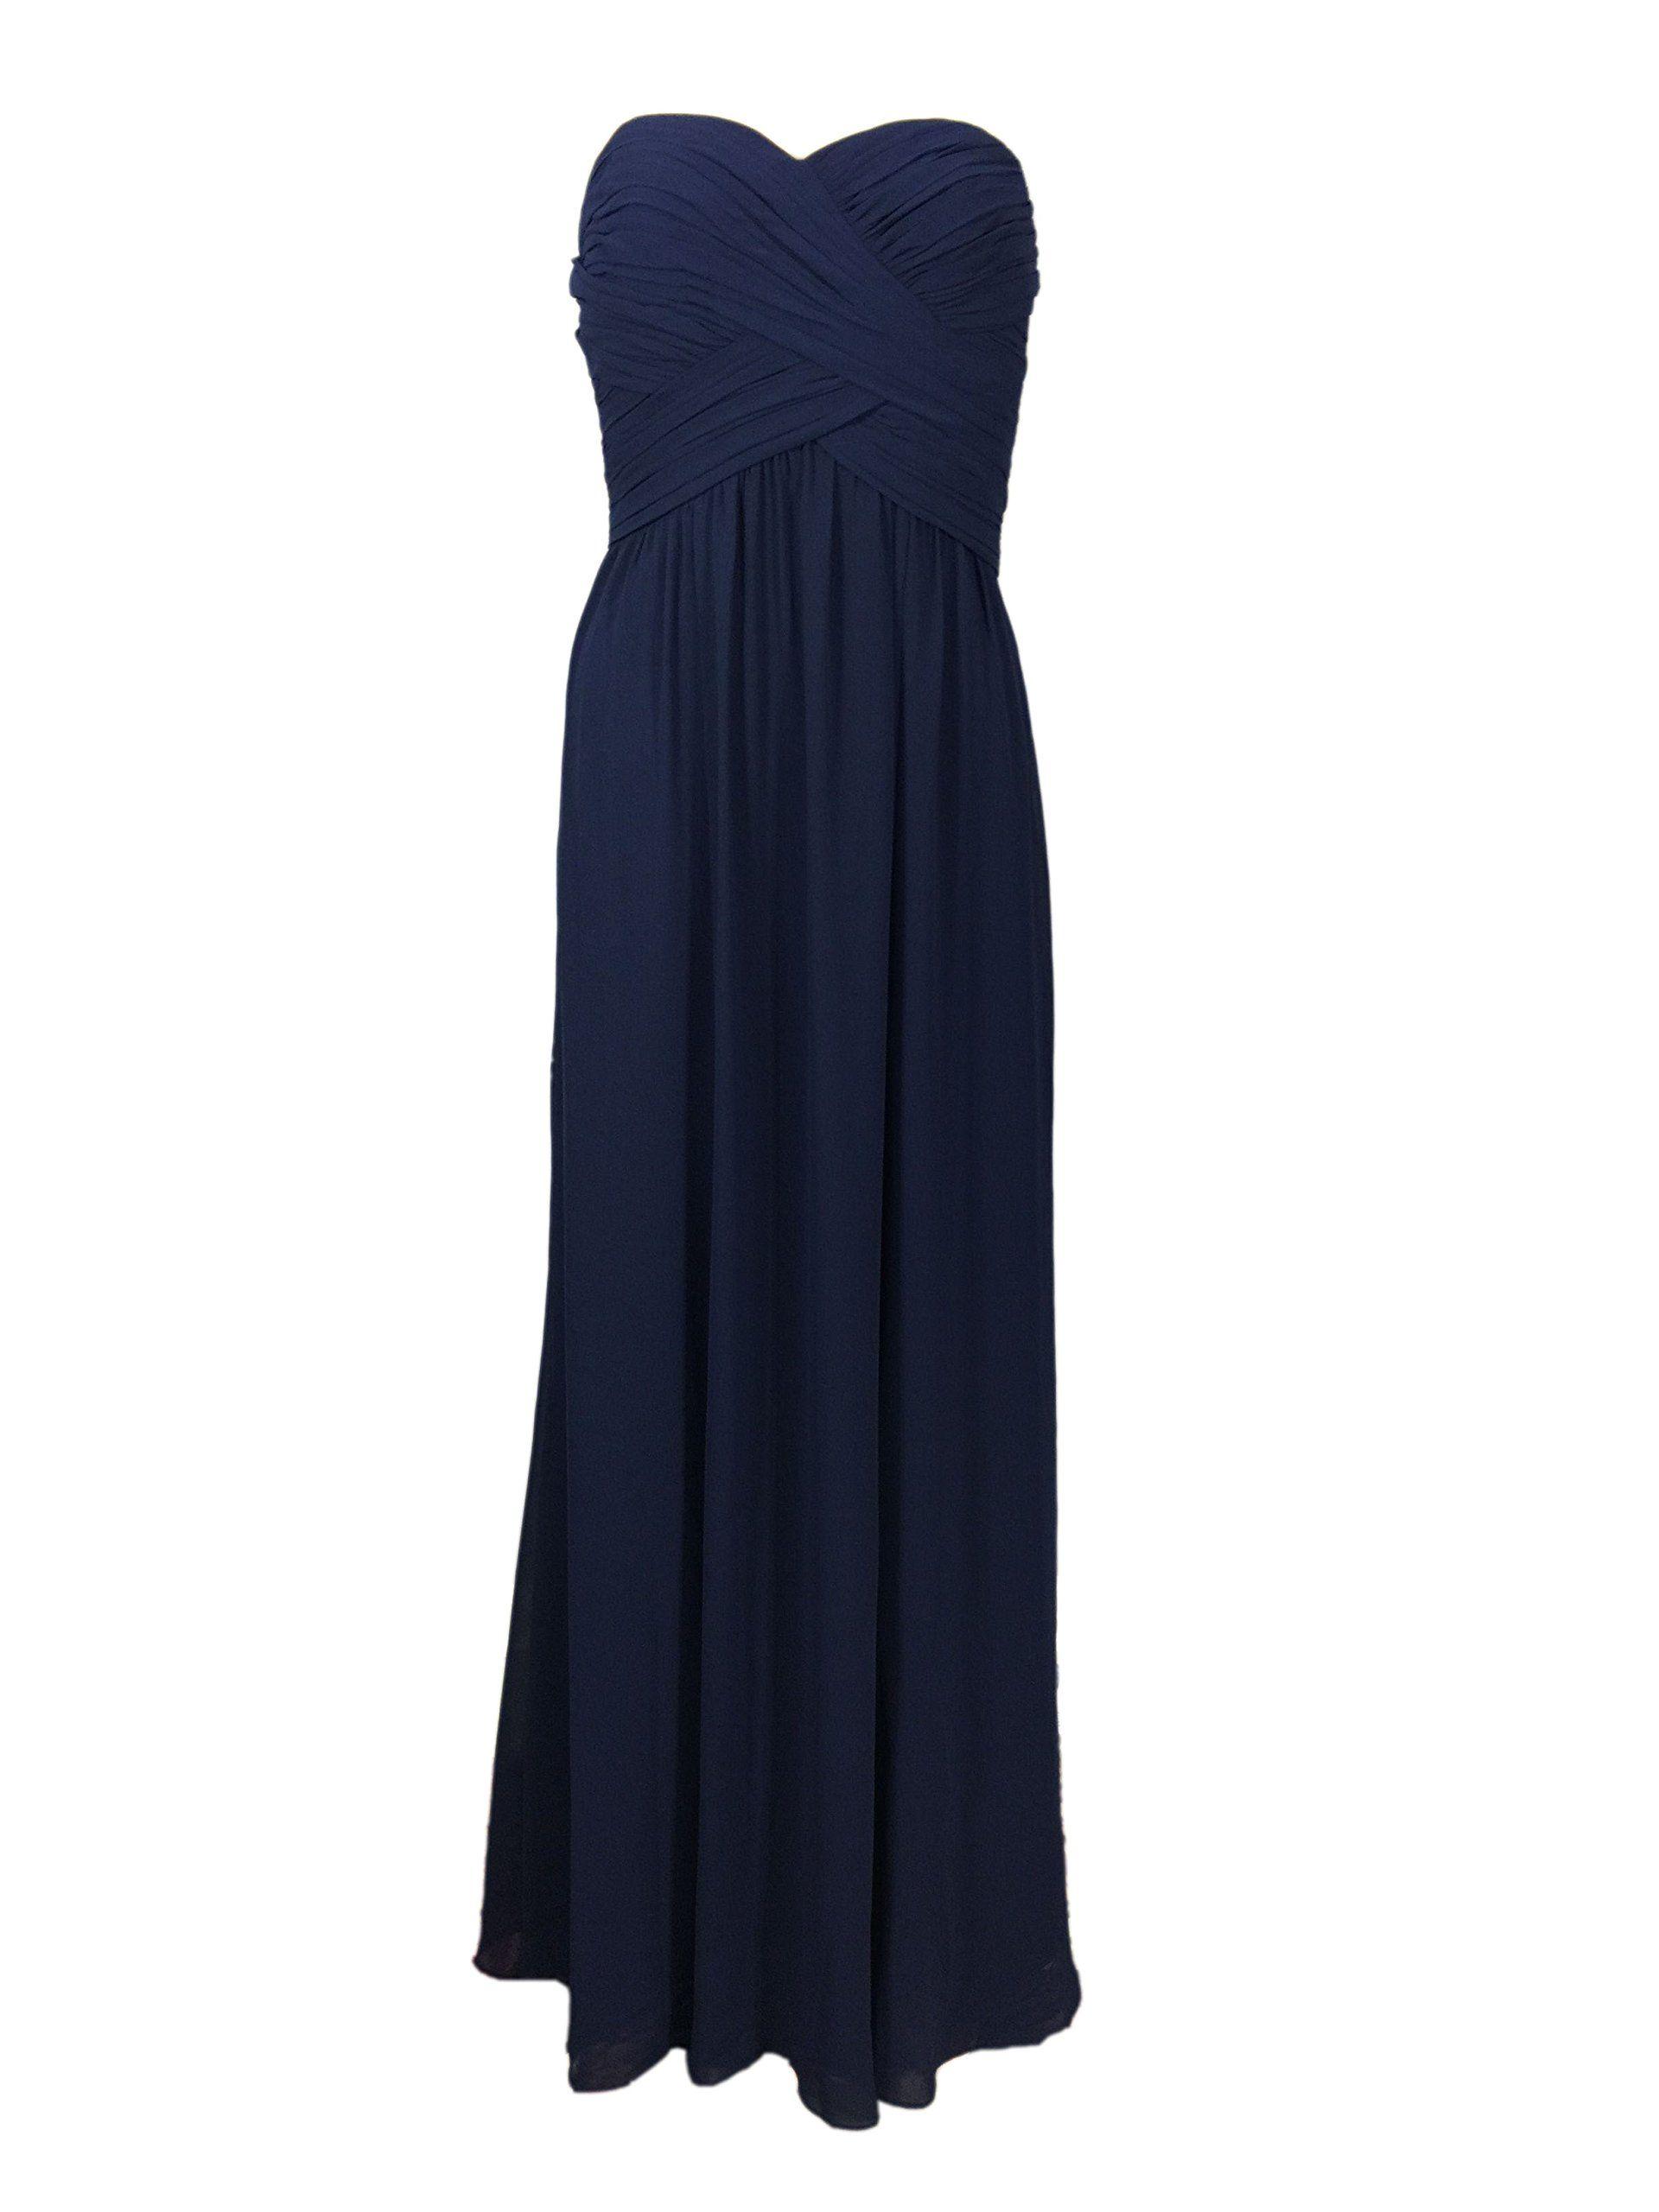 Lauren Ralph Lauren Strapless Empire Waist Evening Gown, Navy (6)